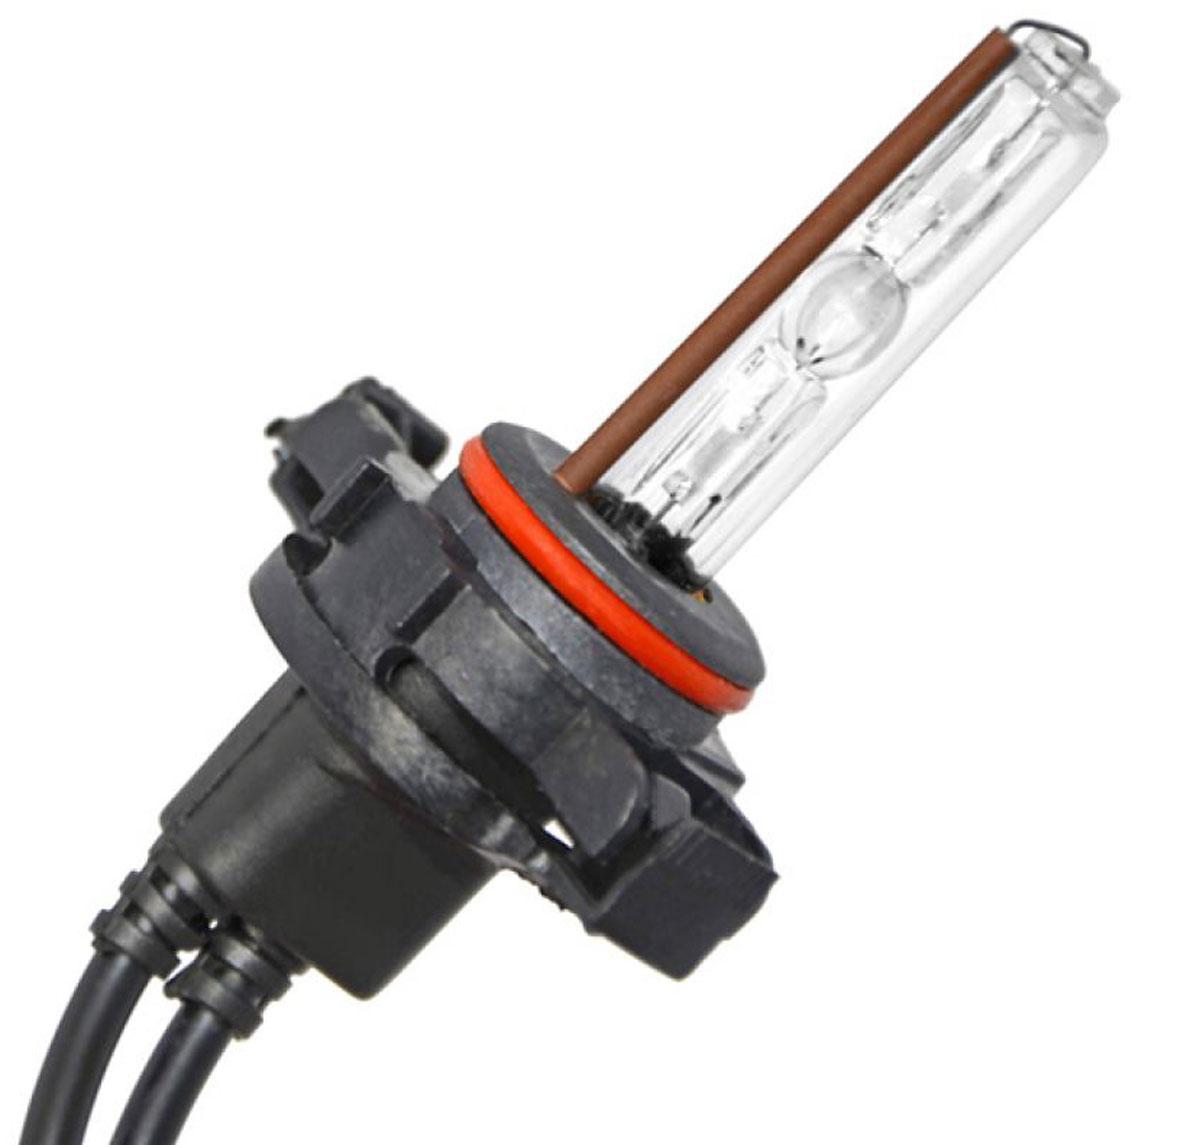 Лампа автомобильная ксеноновая Clearlight, для фар, цоколь H16, 4300K, 35W, 2 штLDL 0H1 643-0LLНадежная ксенононовая лампа для установки в головную оптику автомобиля со спектром света 4300K, 5000К, 6000K, 8000K